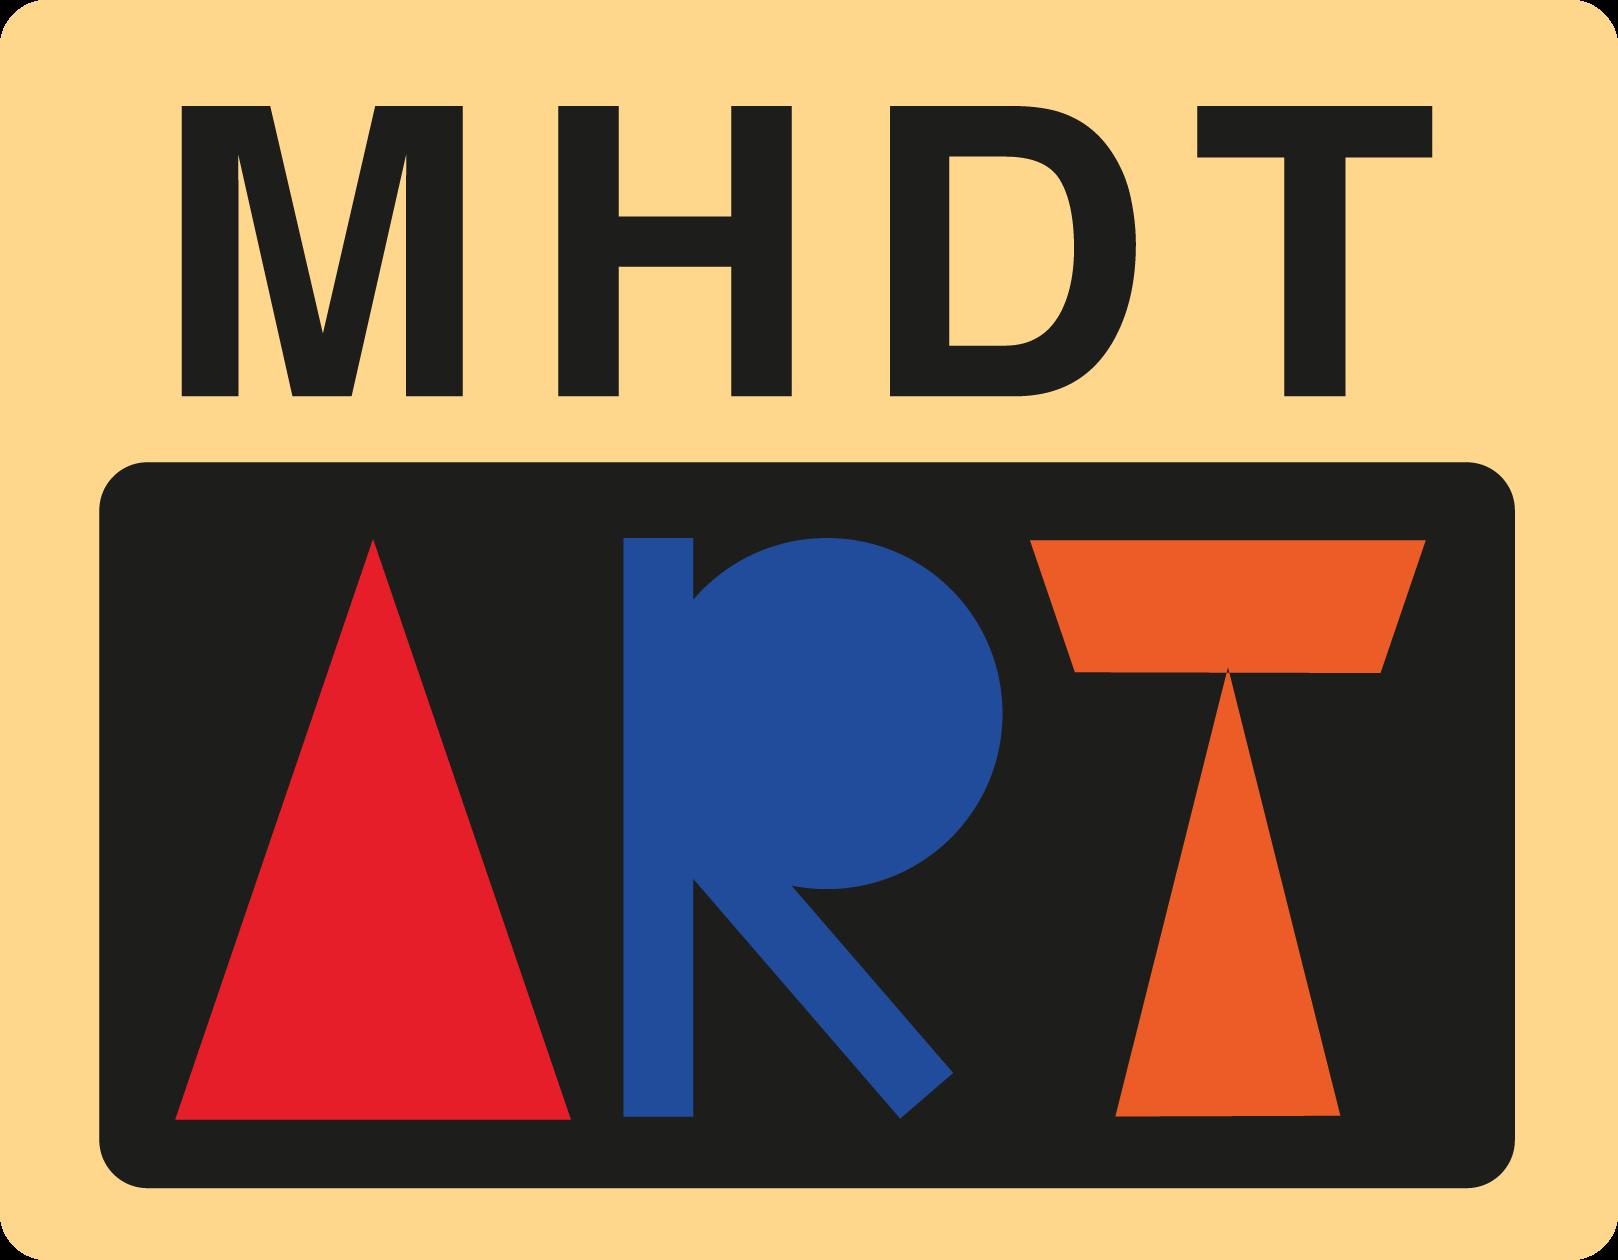 MHDT Arts